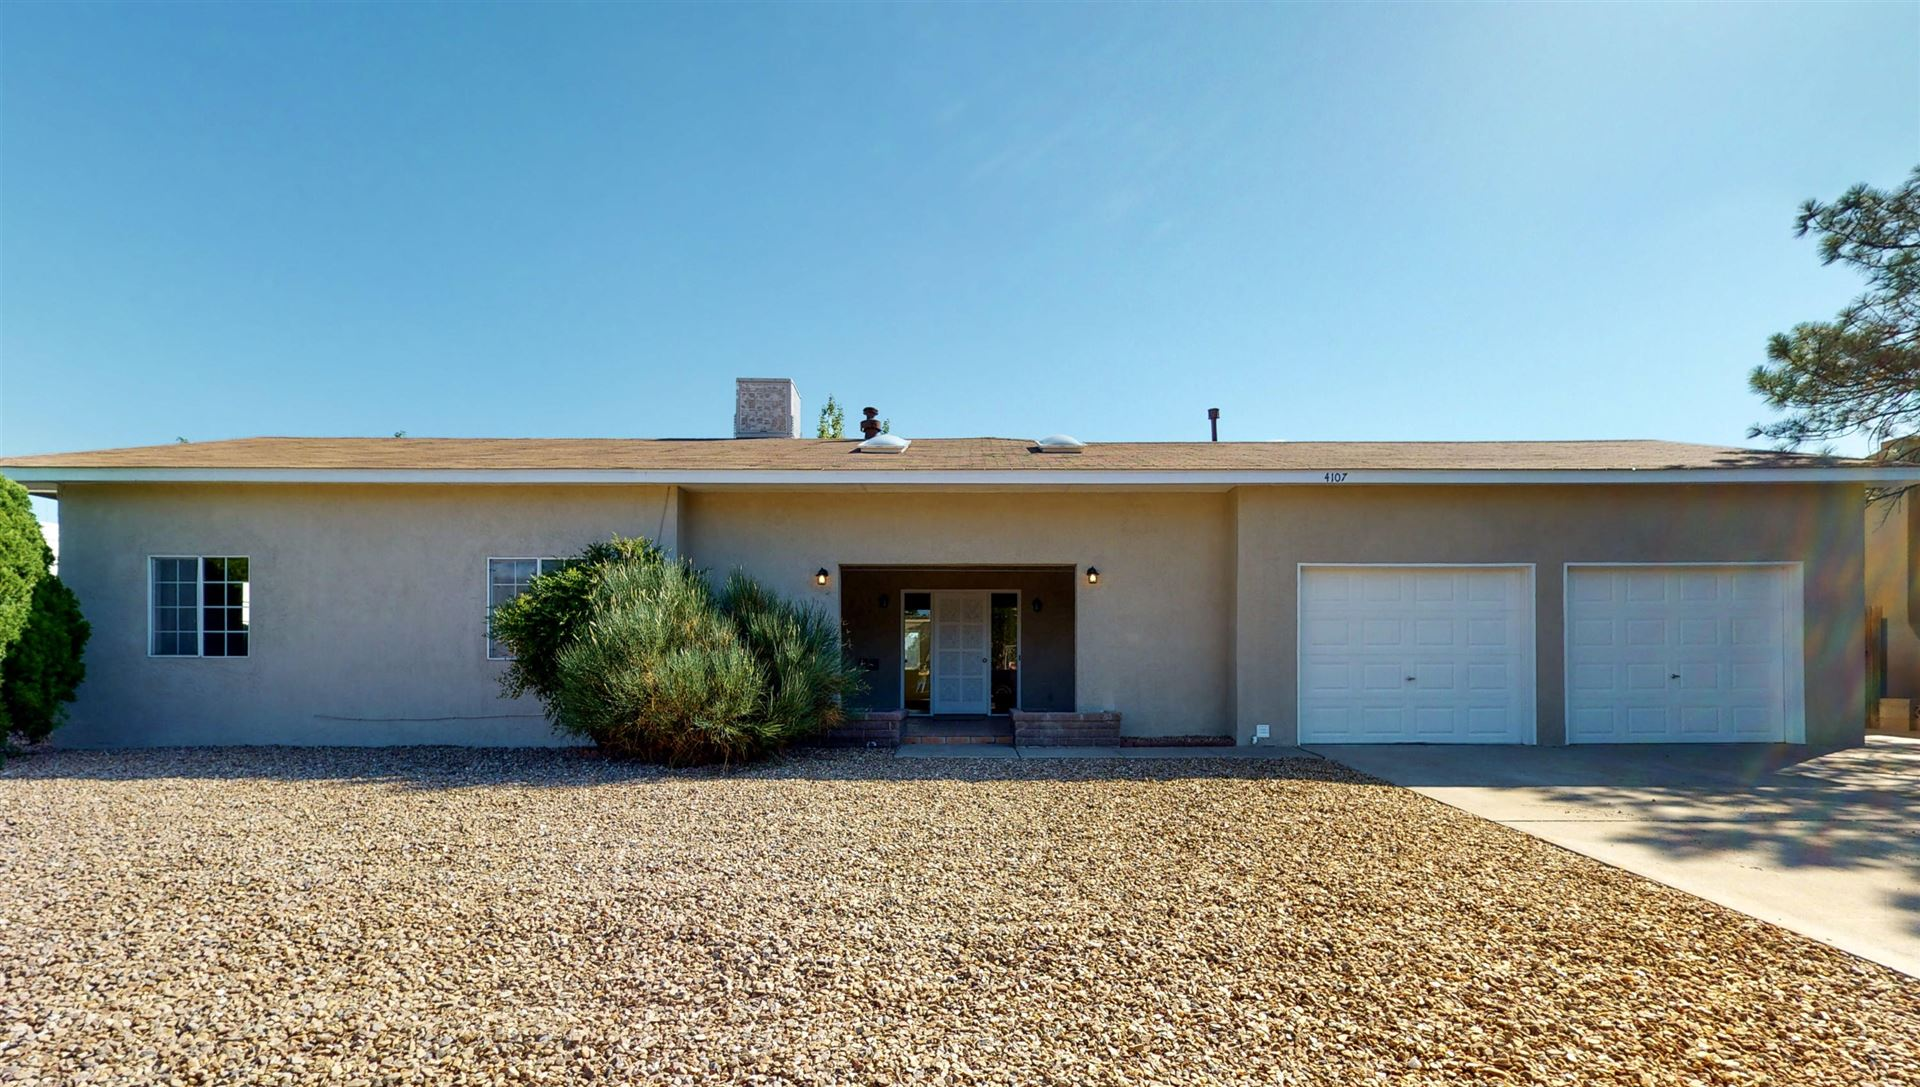 Photo of 4107 LA MERCED Court SE, Rio Rancho, NM 87124 (MLS # 971803)